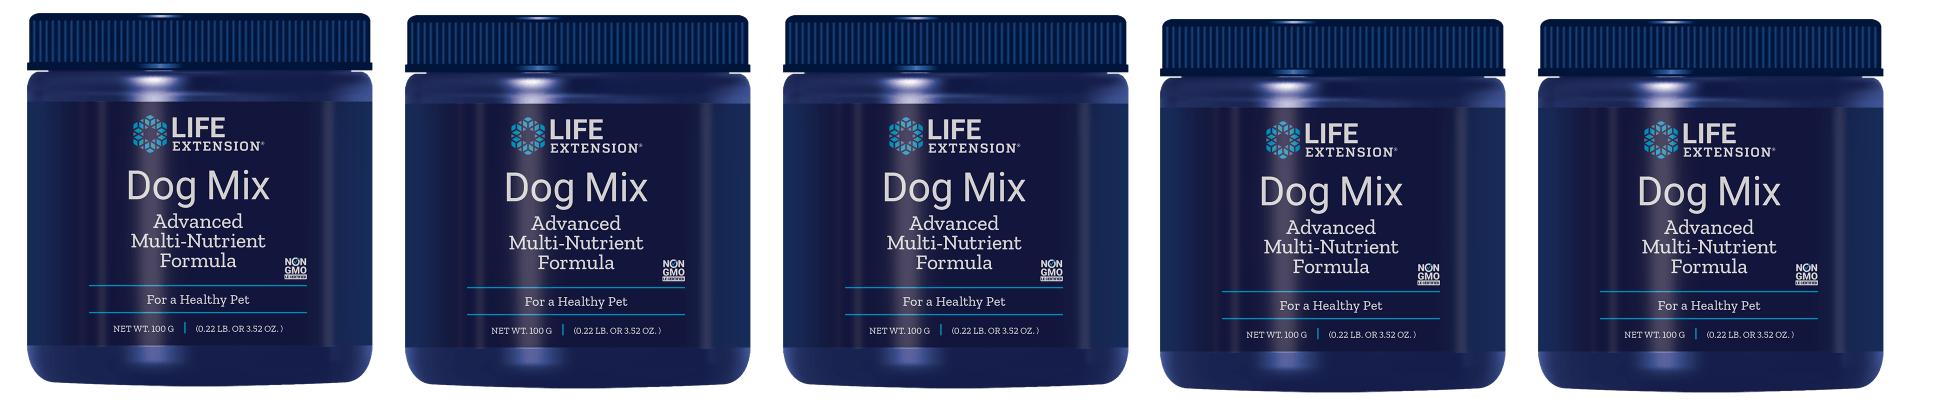 Life Extension Dog Mix (pet Vitamins), 100 Grams, 5-pack